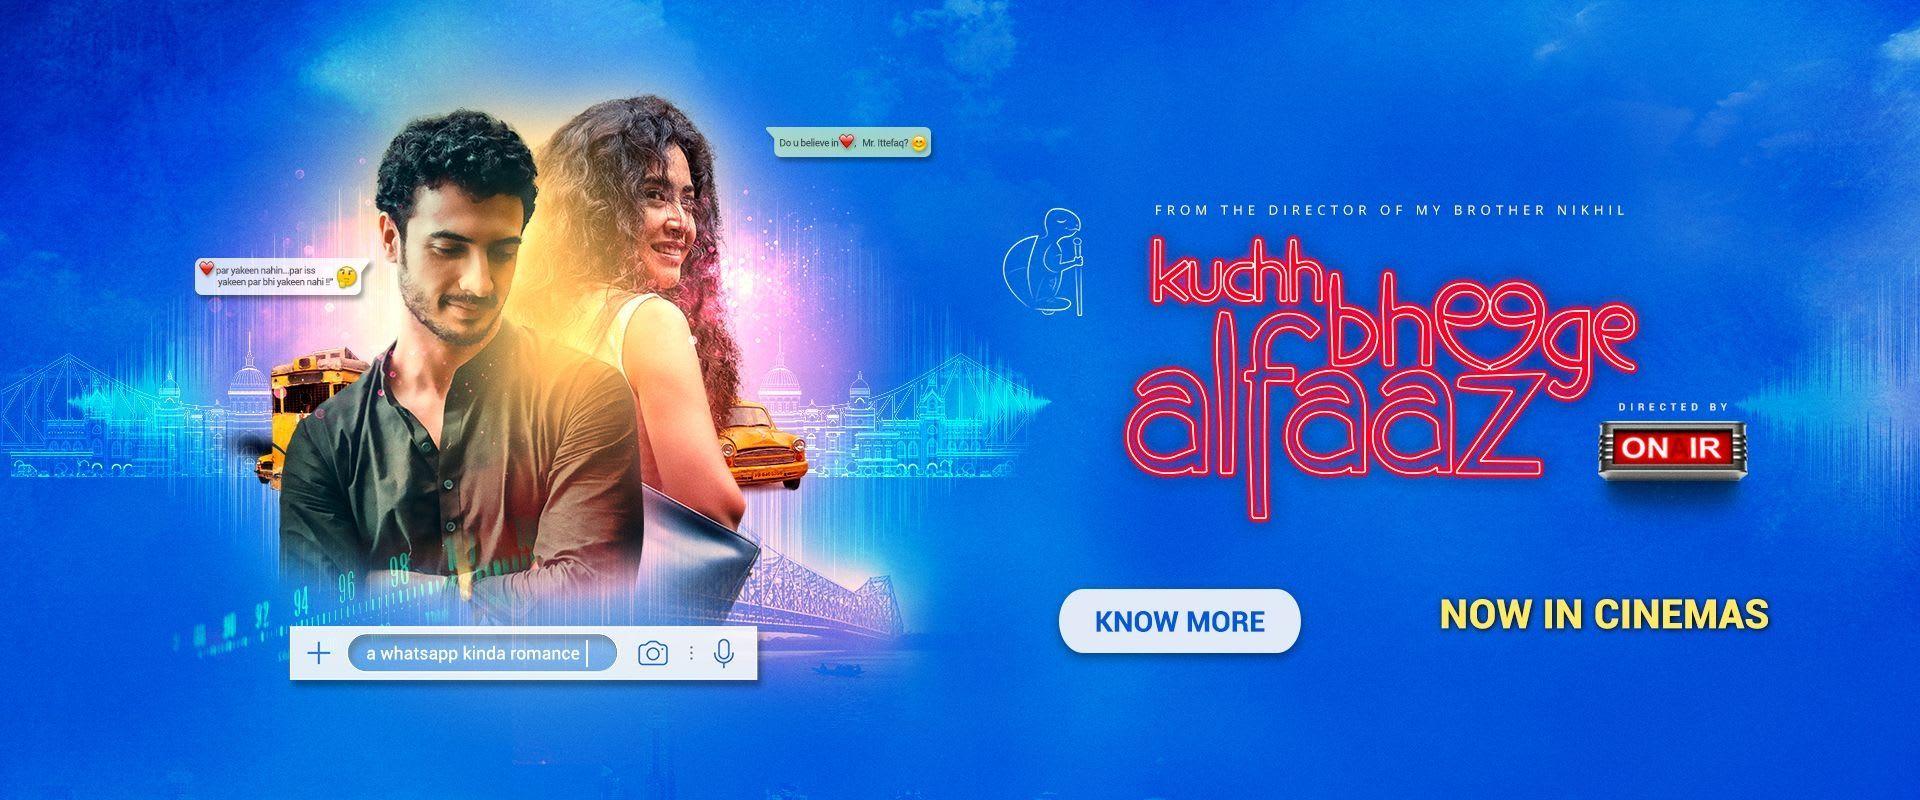 Yoodlee Films - Kuchh Bheege Alfaaz